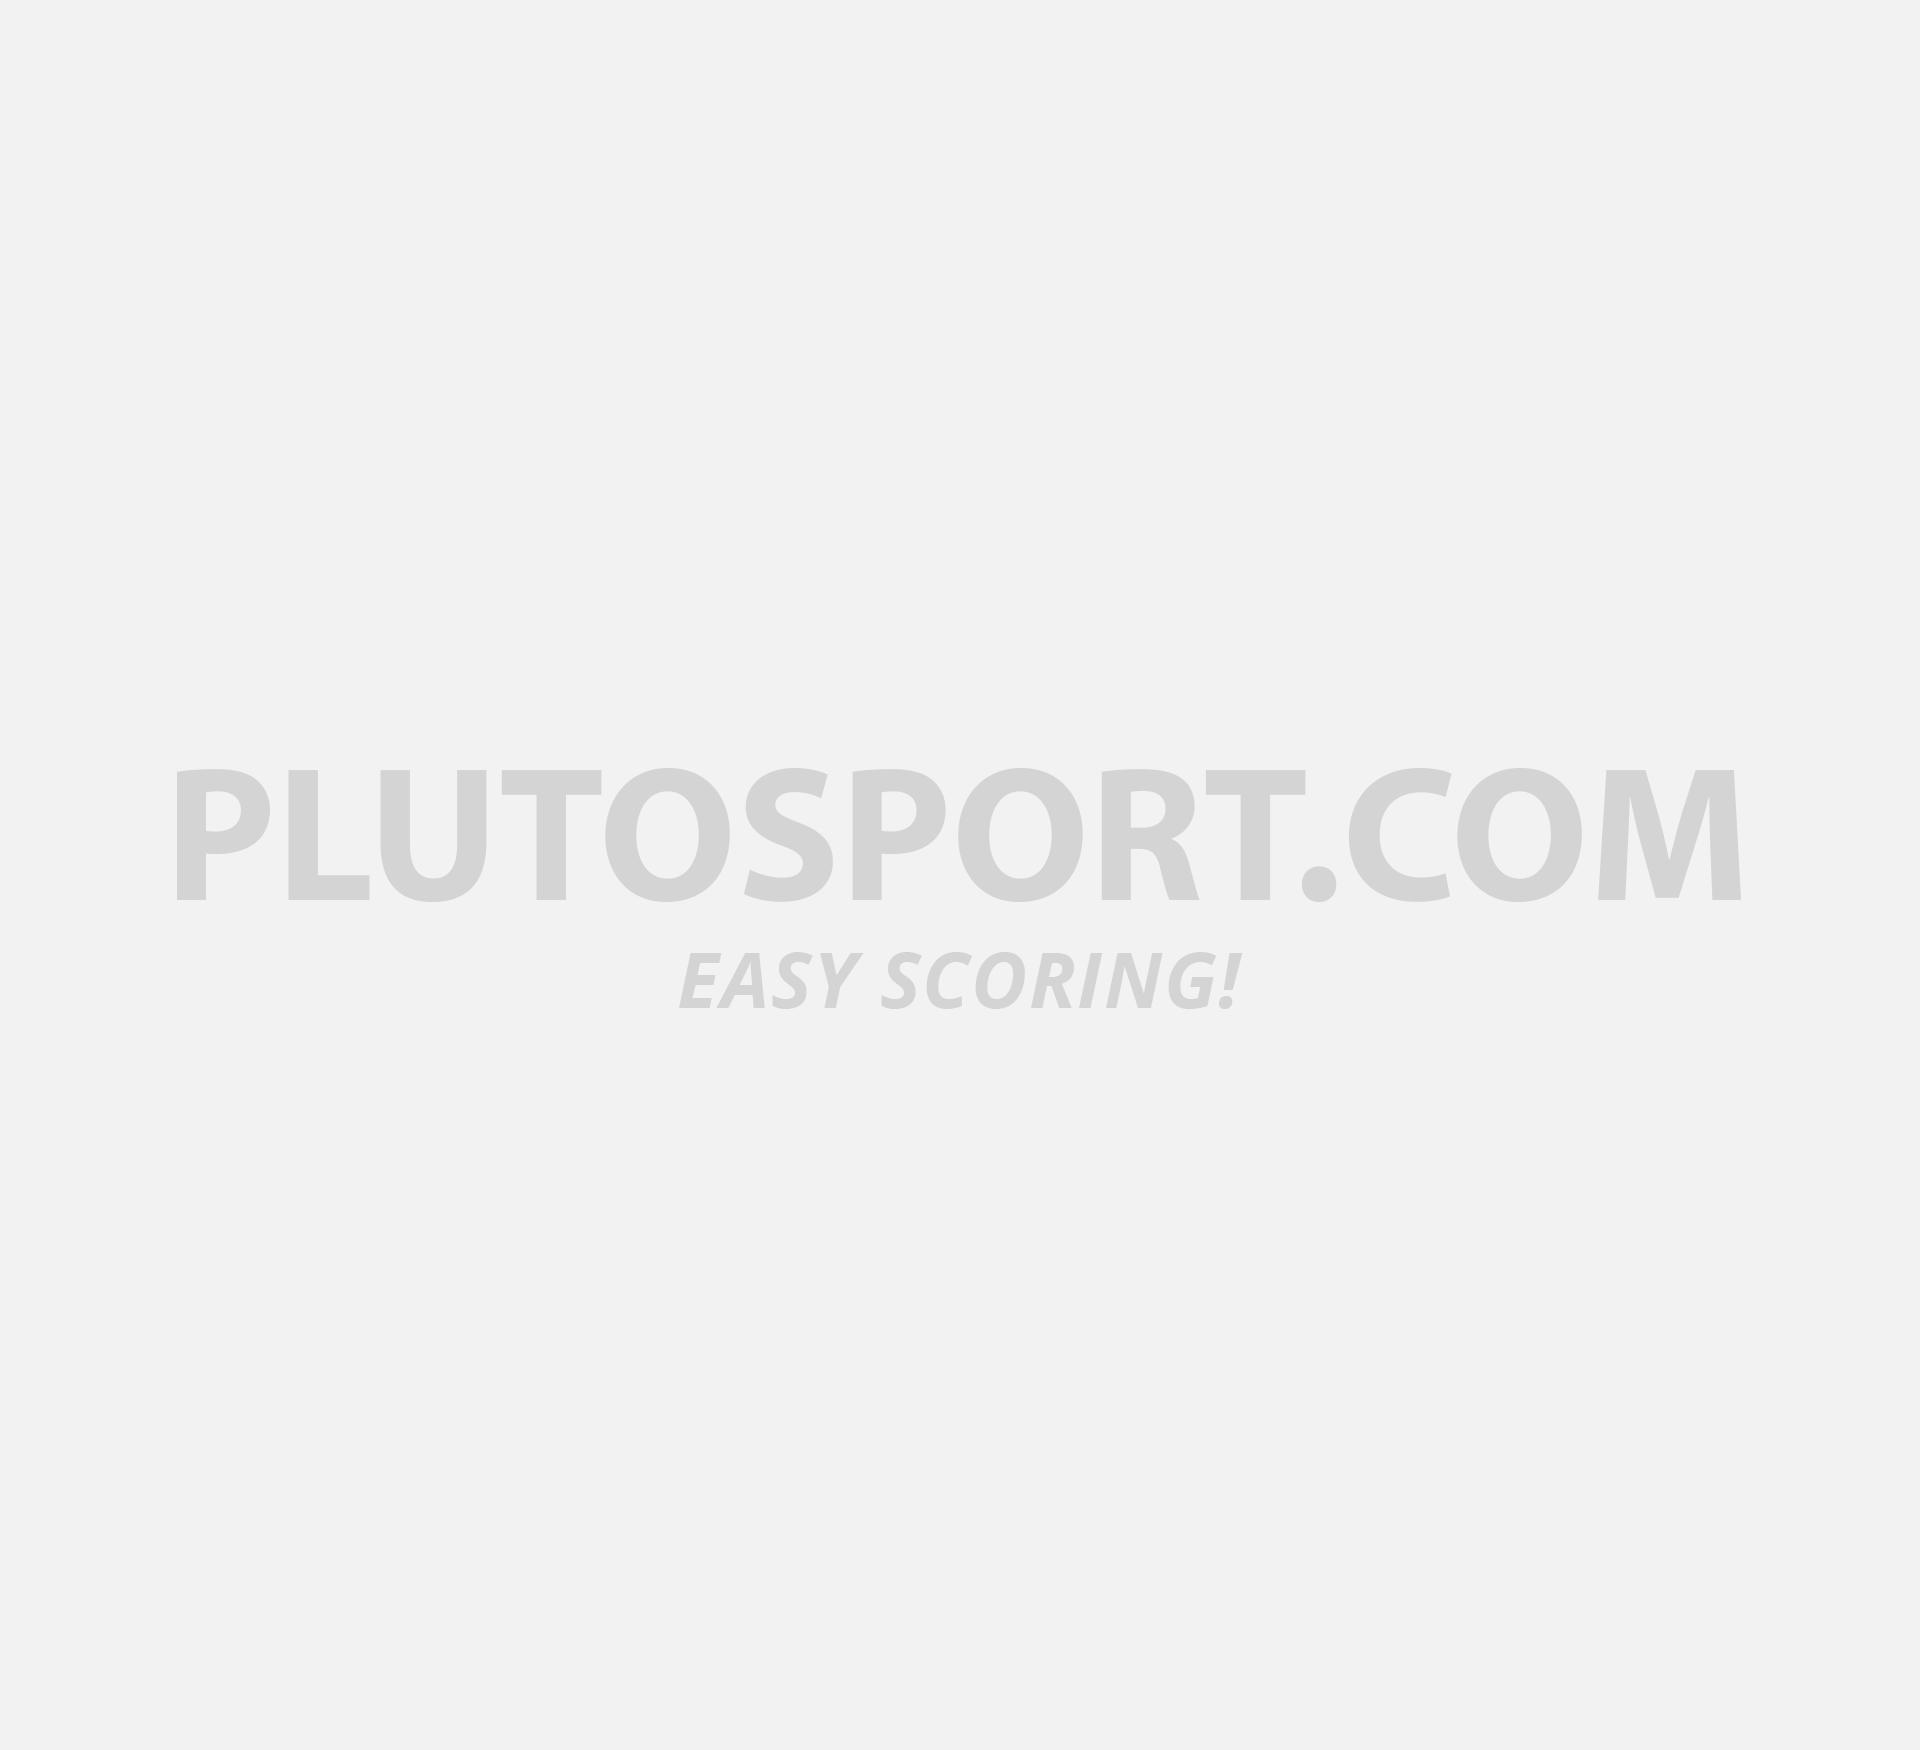 Asics Gel De Corte Estoril Para Hombre Zapatillas De Tenis 3tAxA48